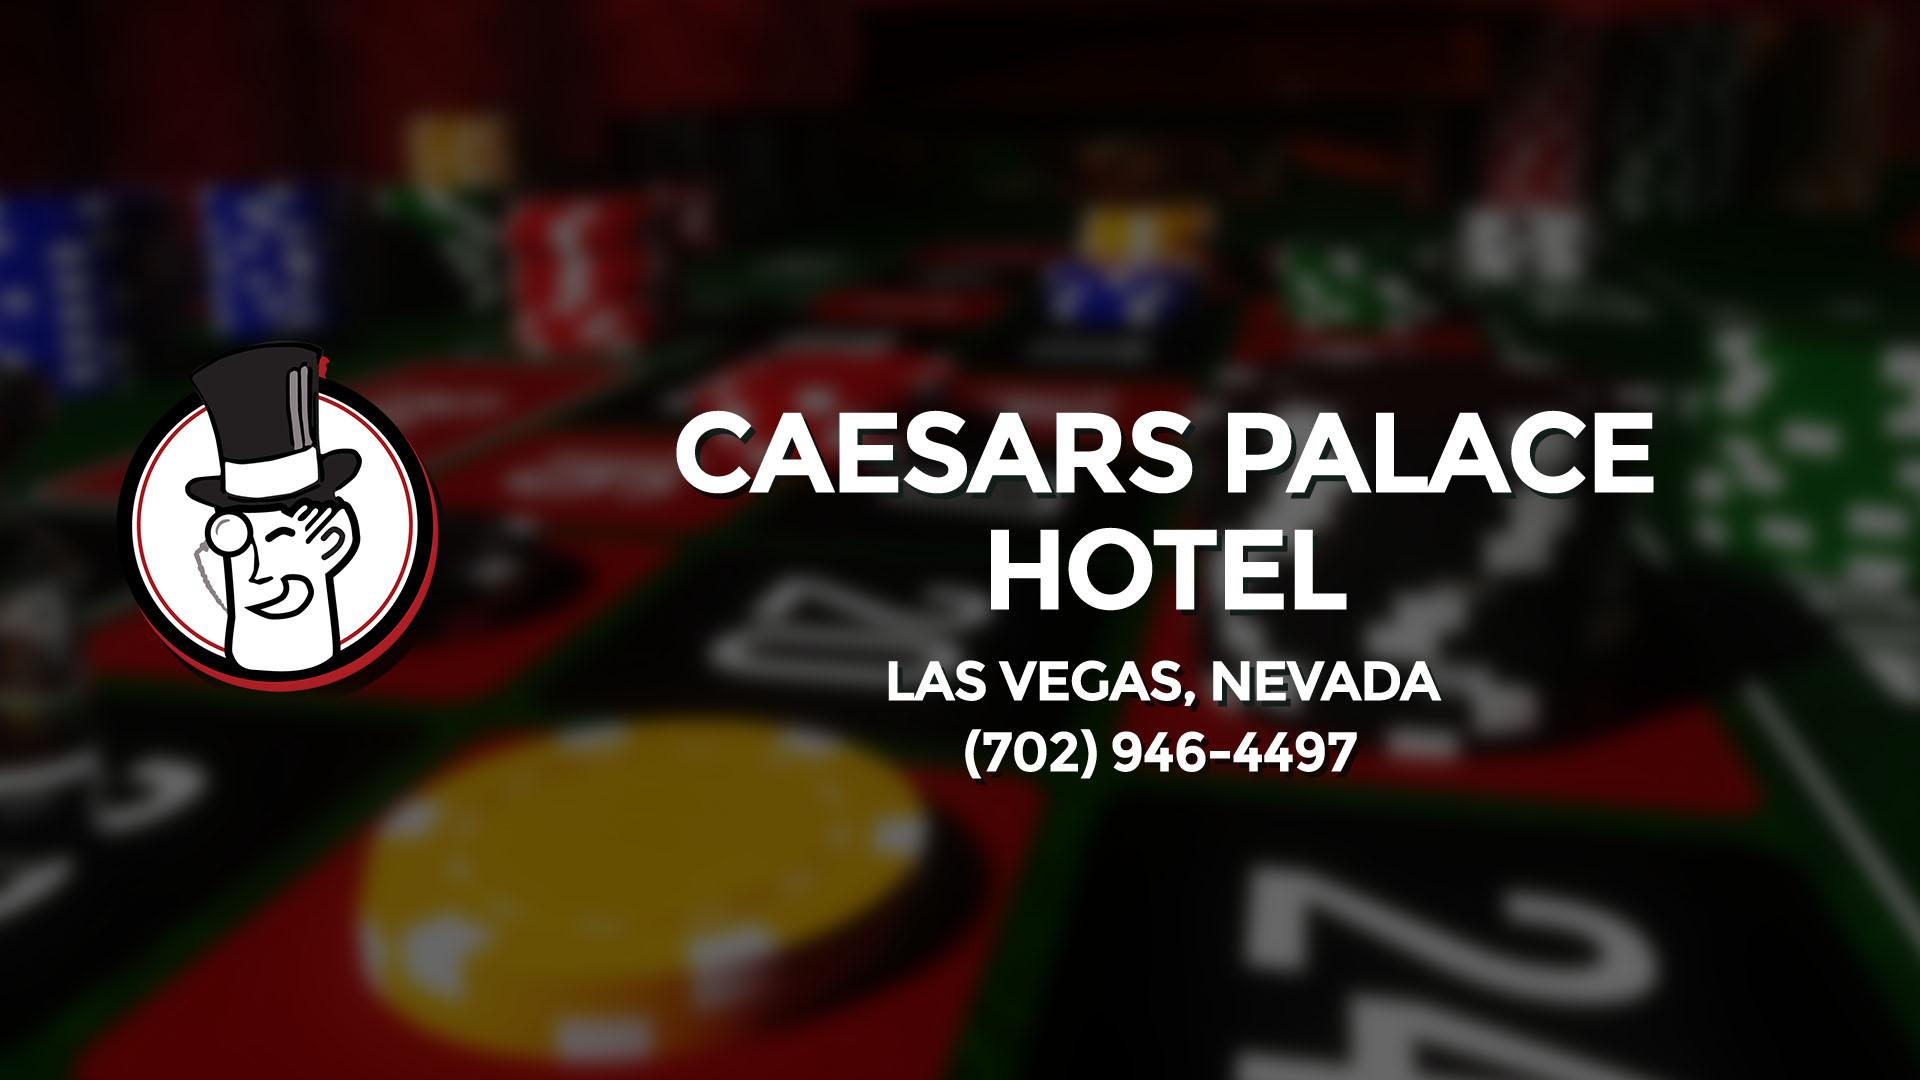 CAESARS PALACE HOTEL LAS VEGAS NV